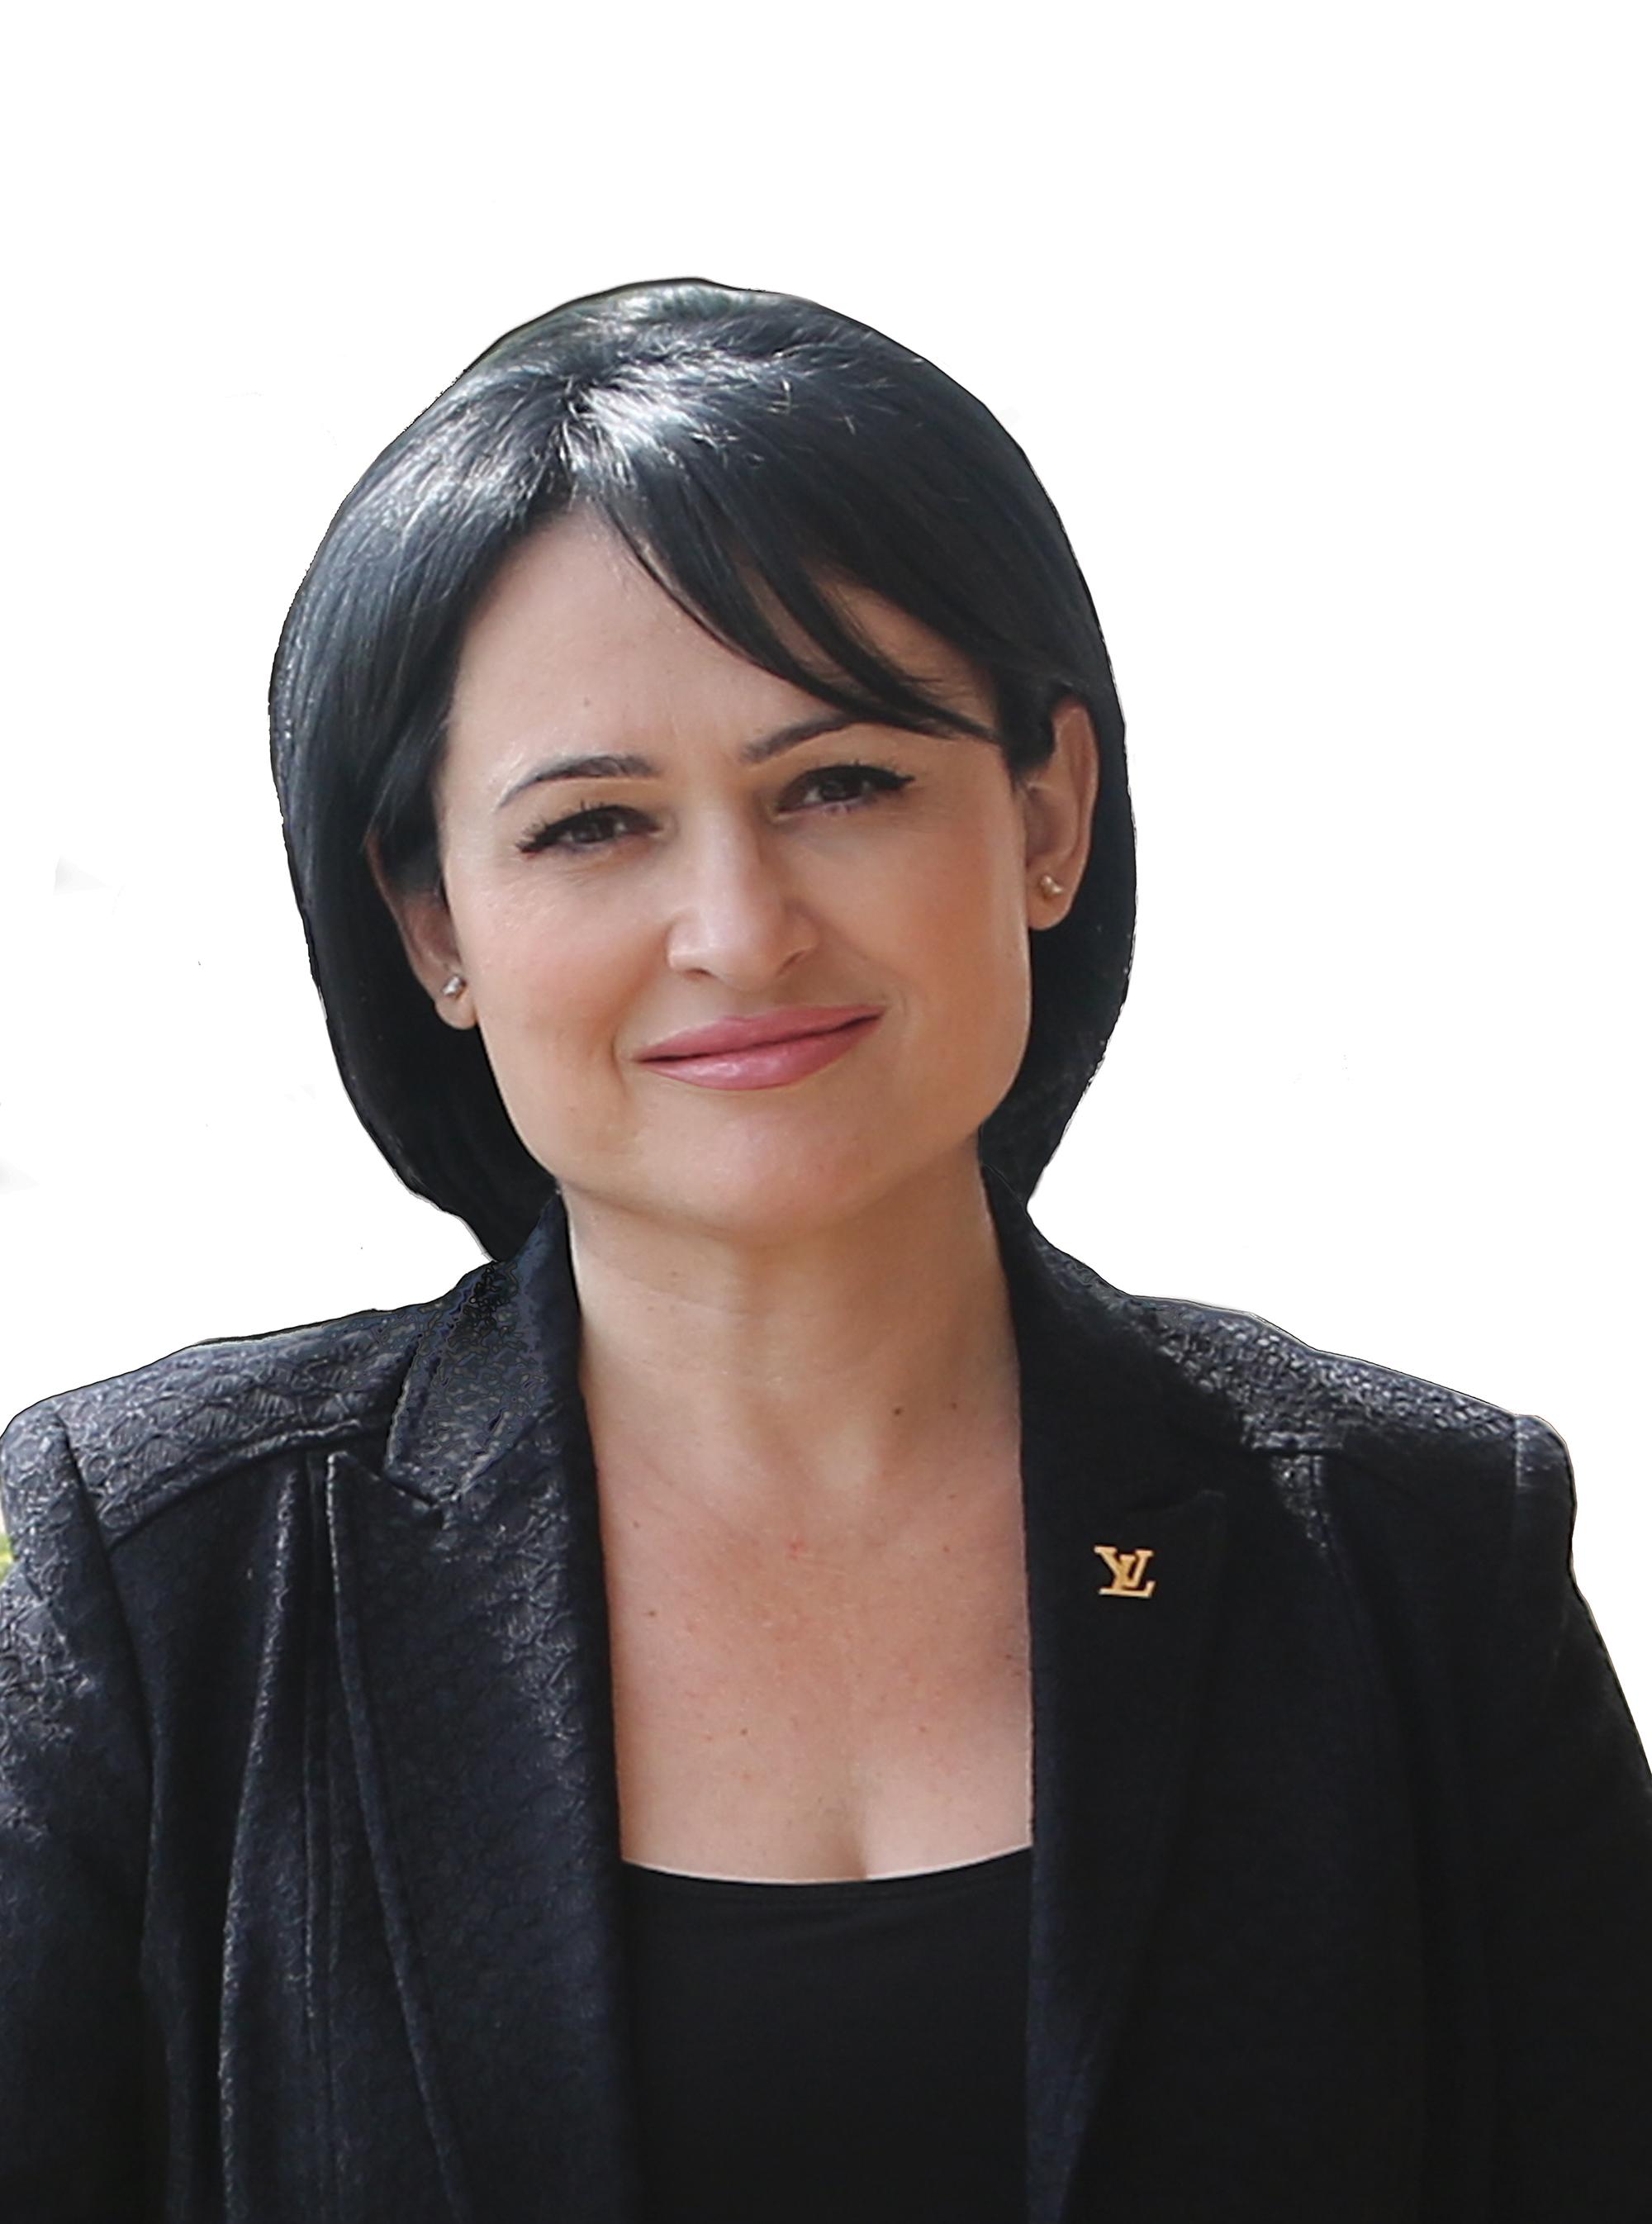 Naira Khnkoyan